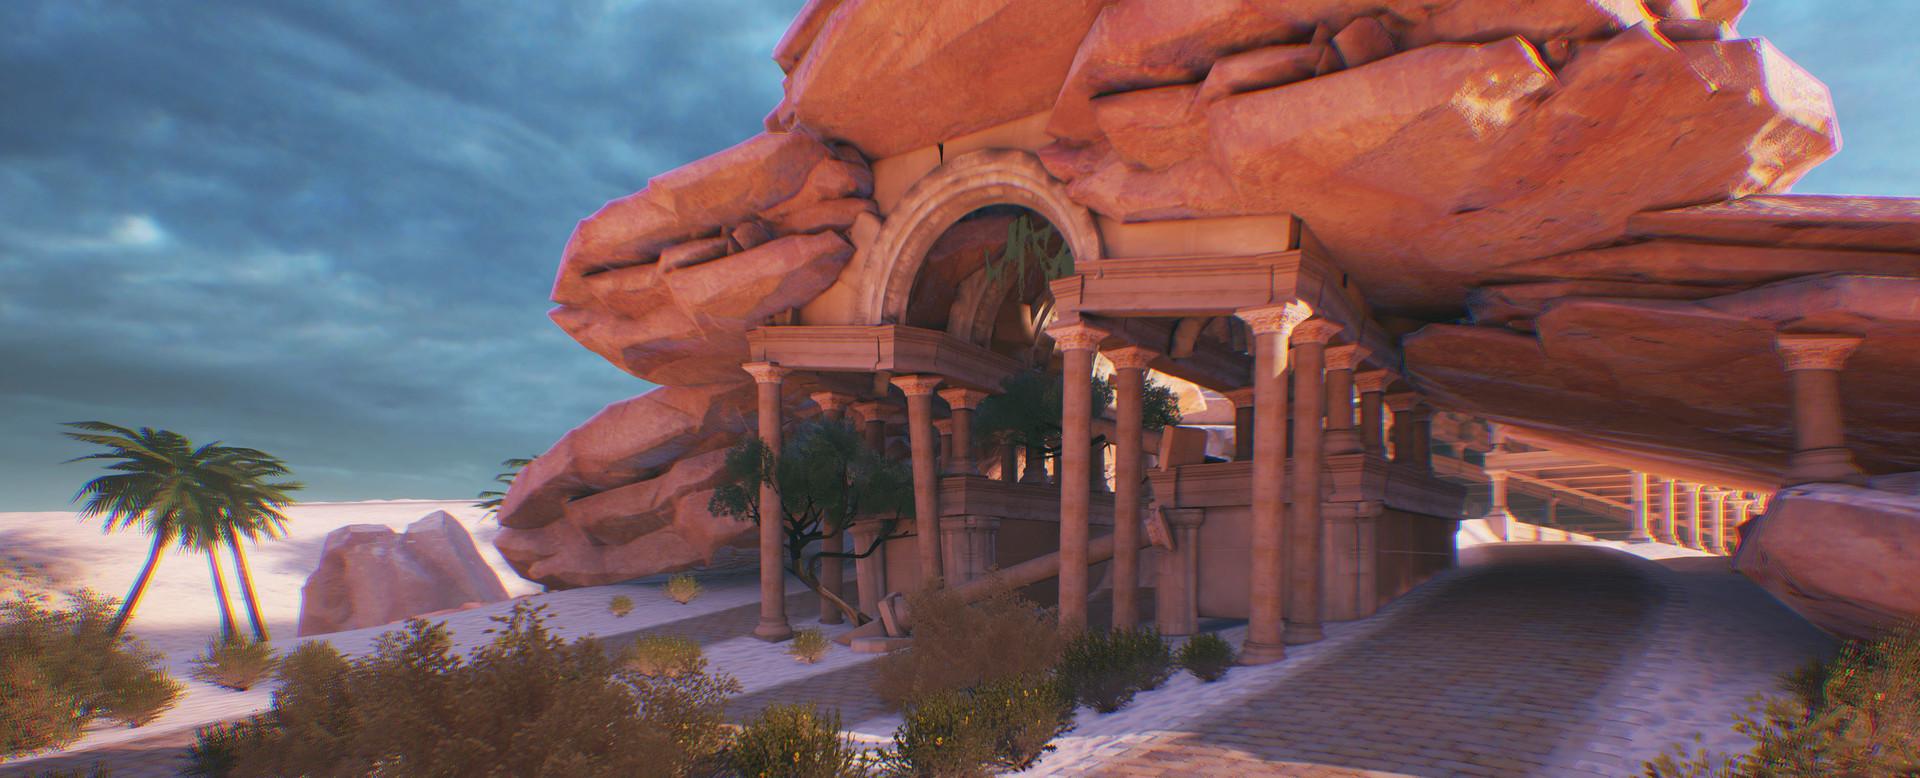 Florian thomasset desert temple 2